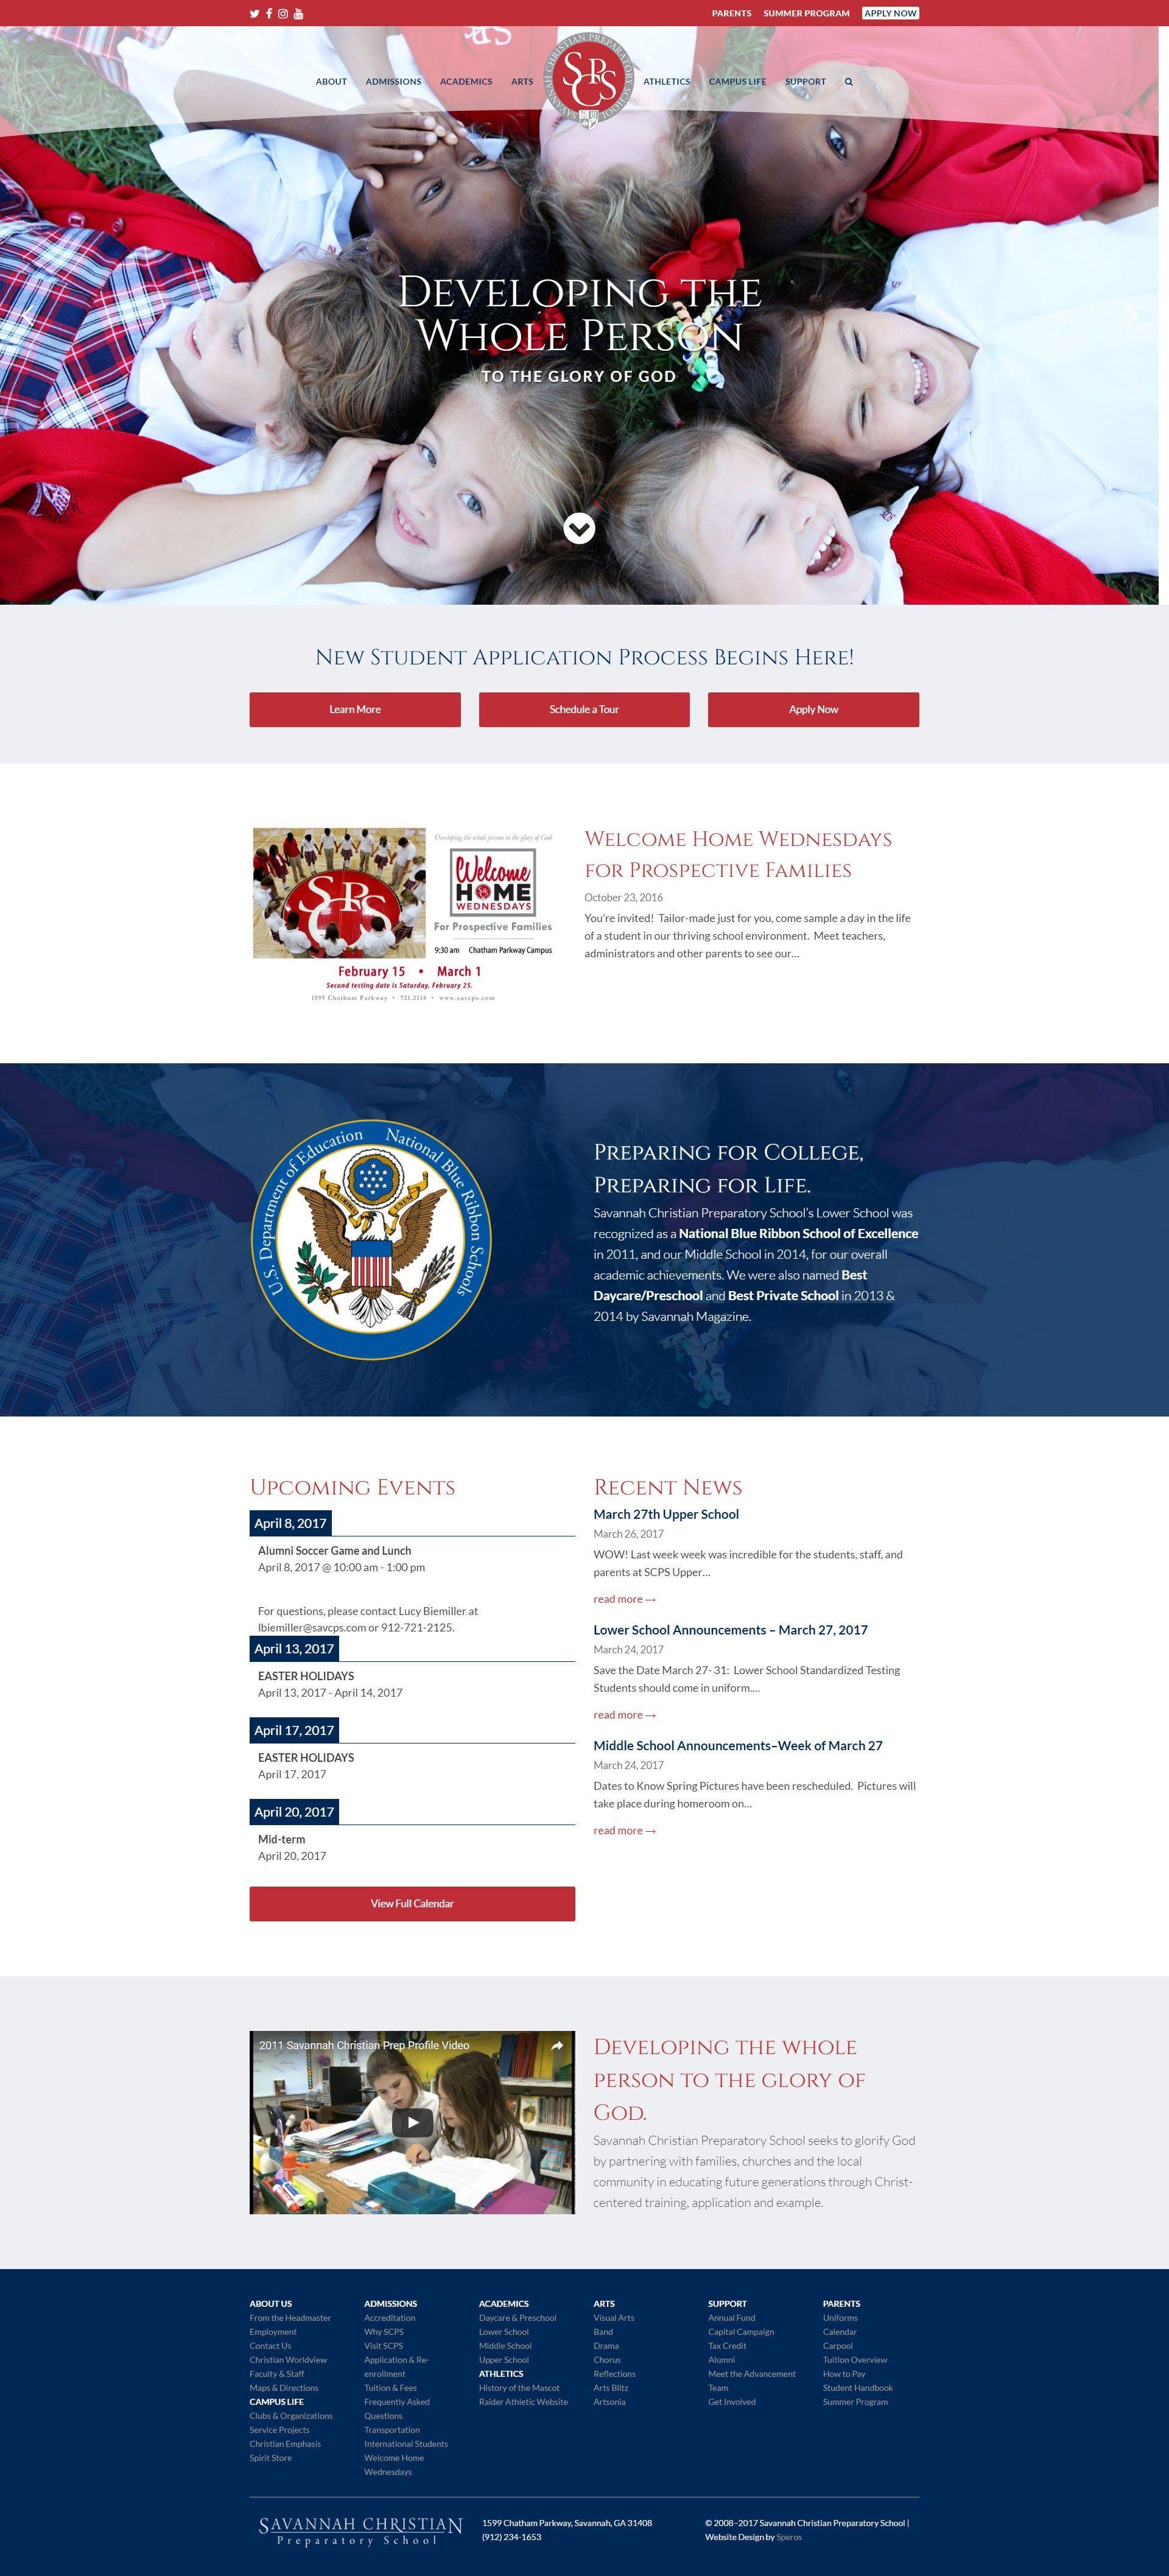 Savannah Christian Preparatory School Website Design In 2020 Website Template Design Portfolio Website Design Online Web Design